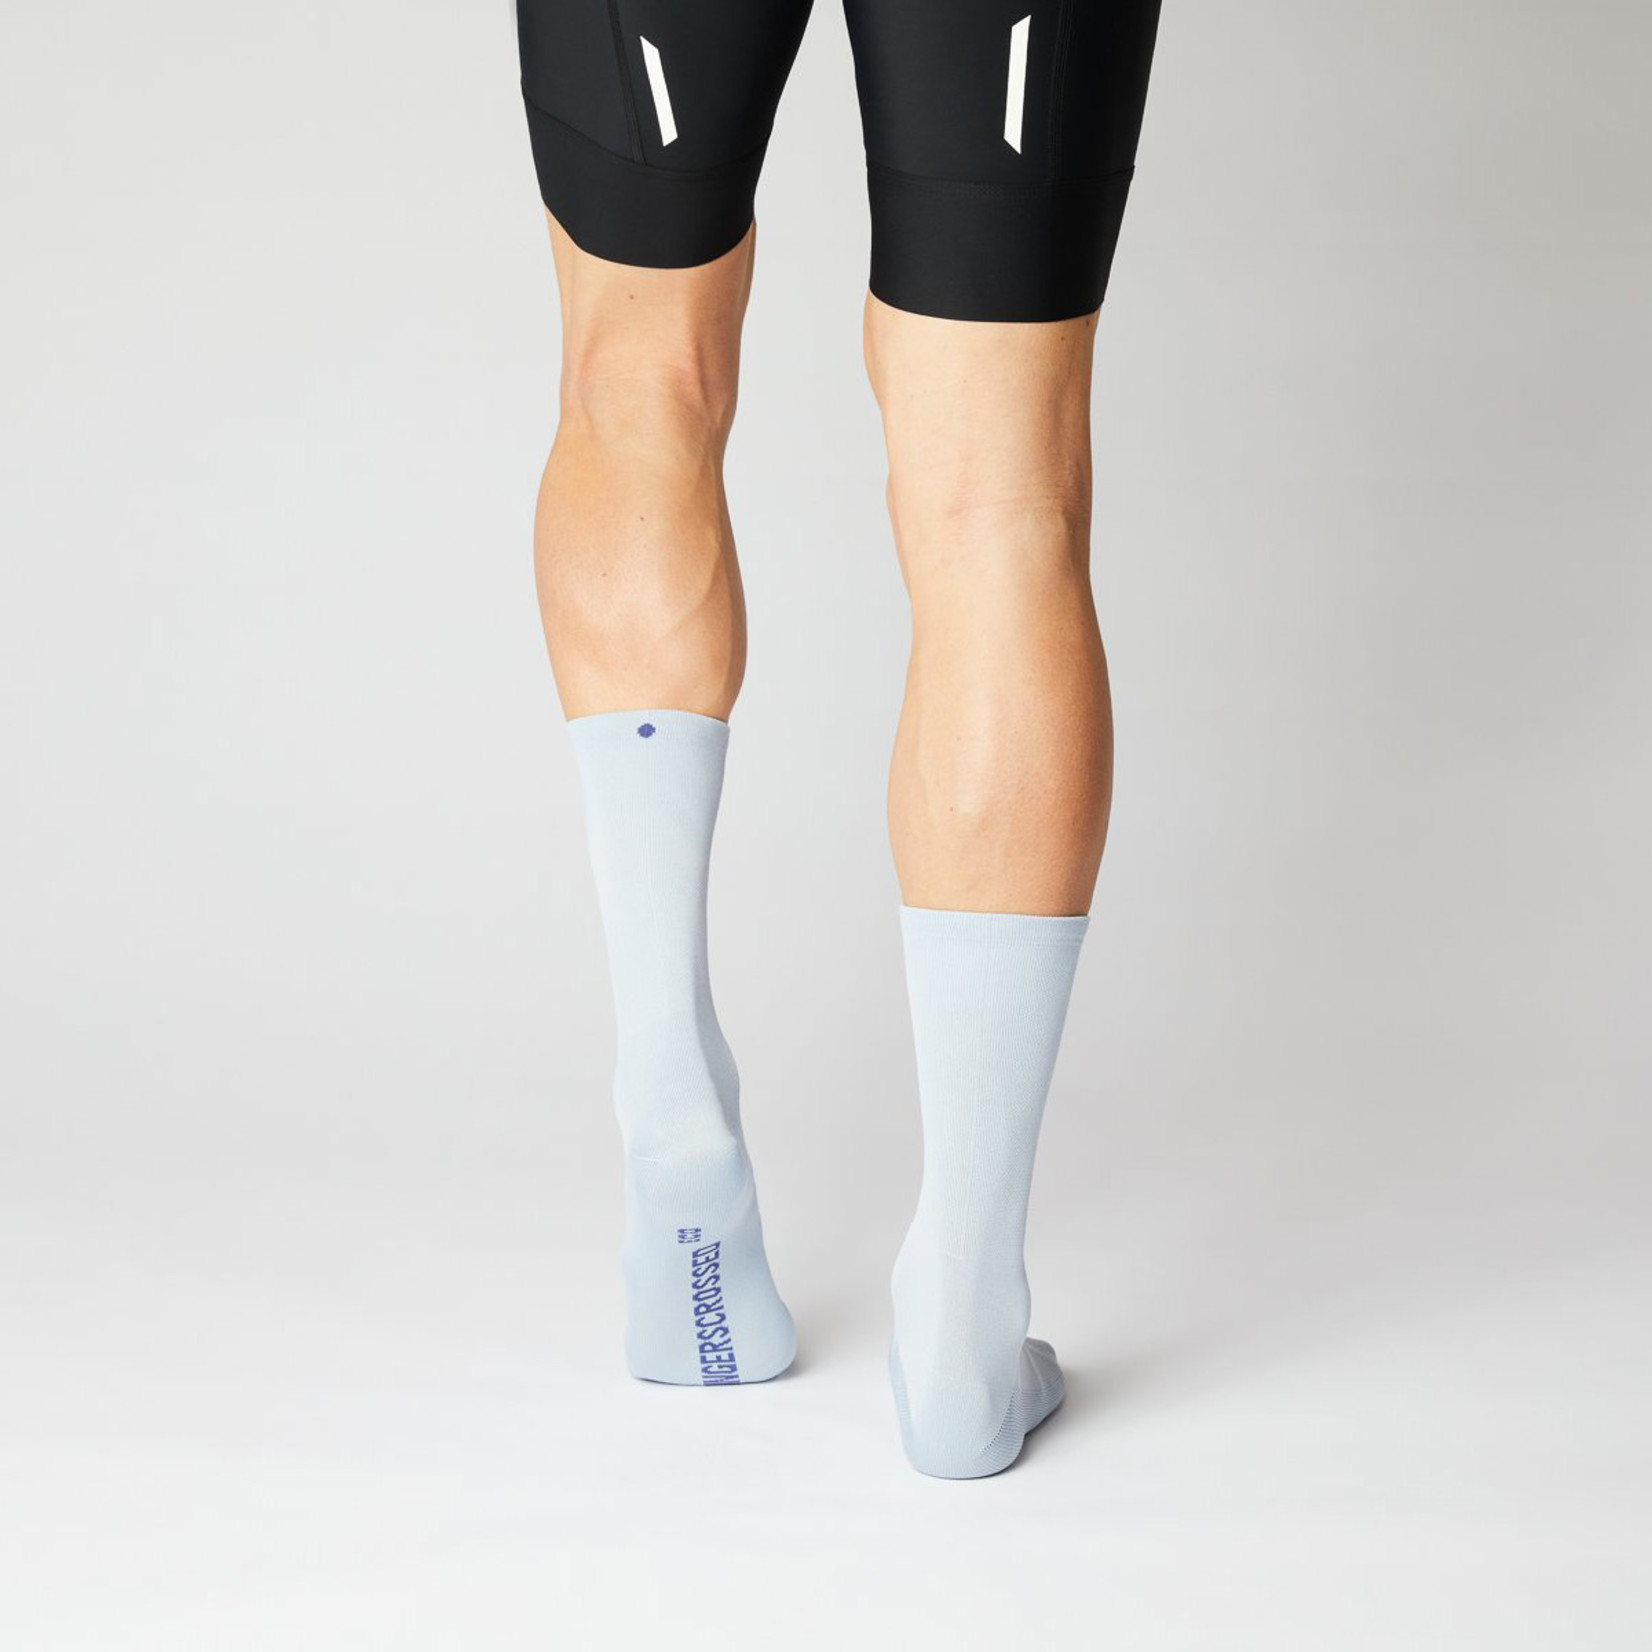 Fingerscrossed FINGERSCROSSED Eco Socks - Skipper Blue